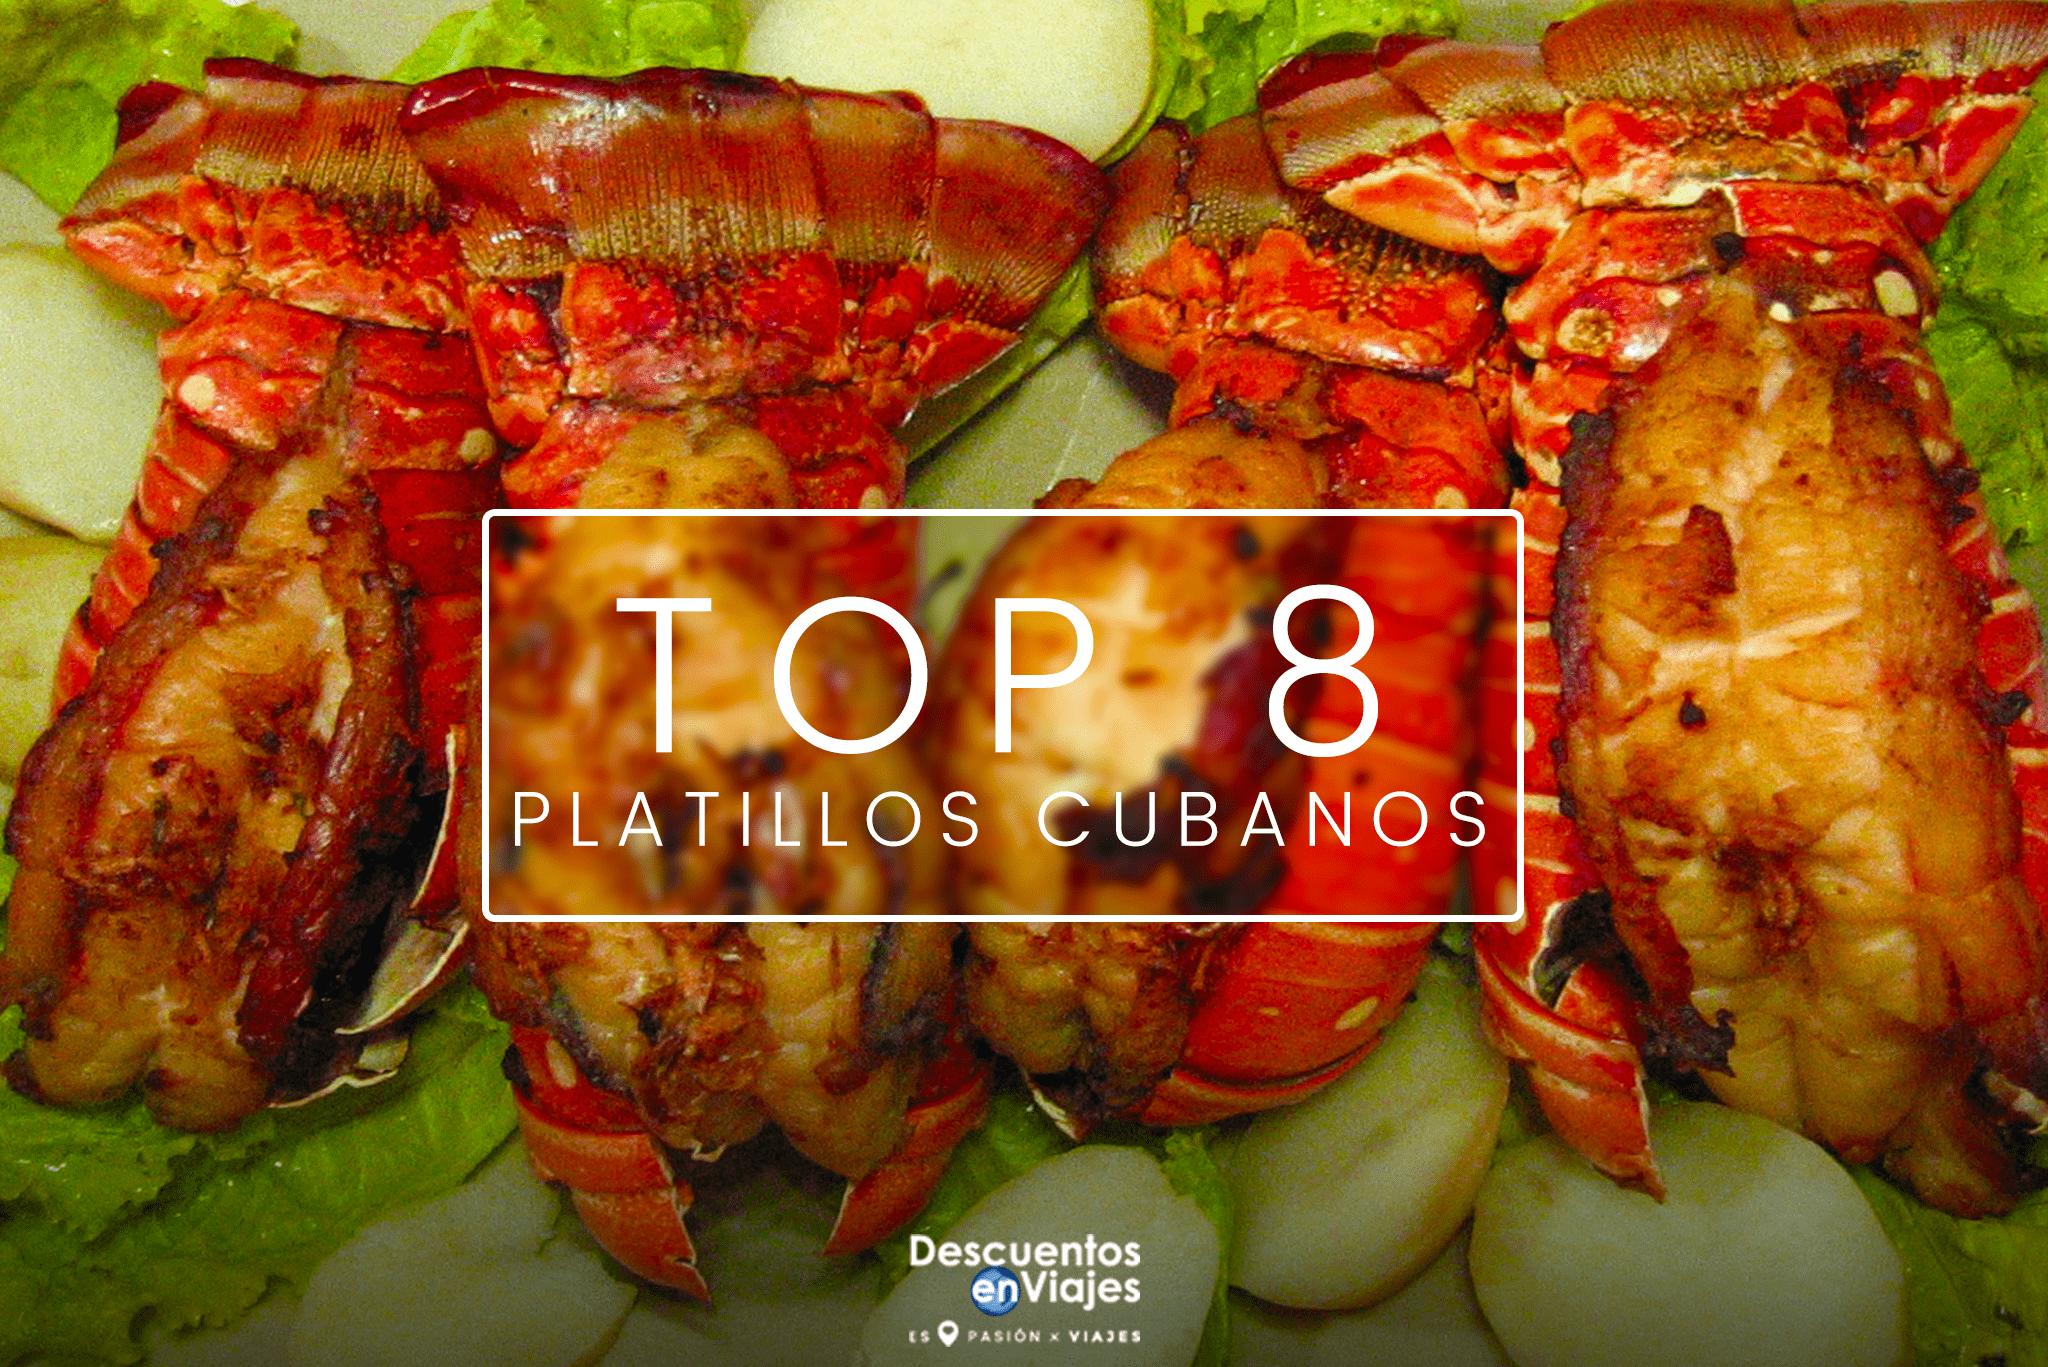 TOP 8 PLATILLOS CUBANOS